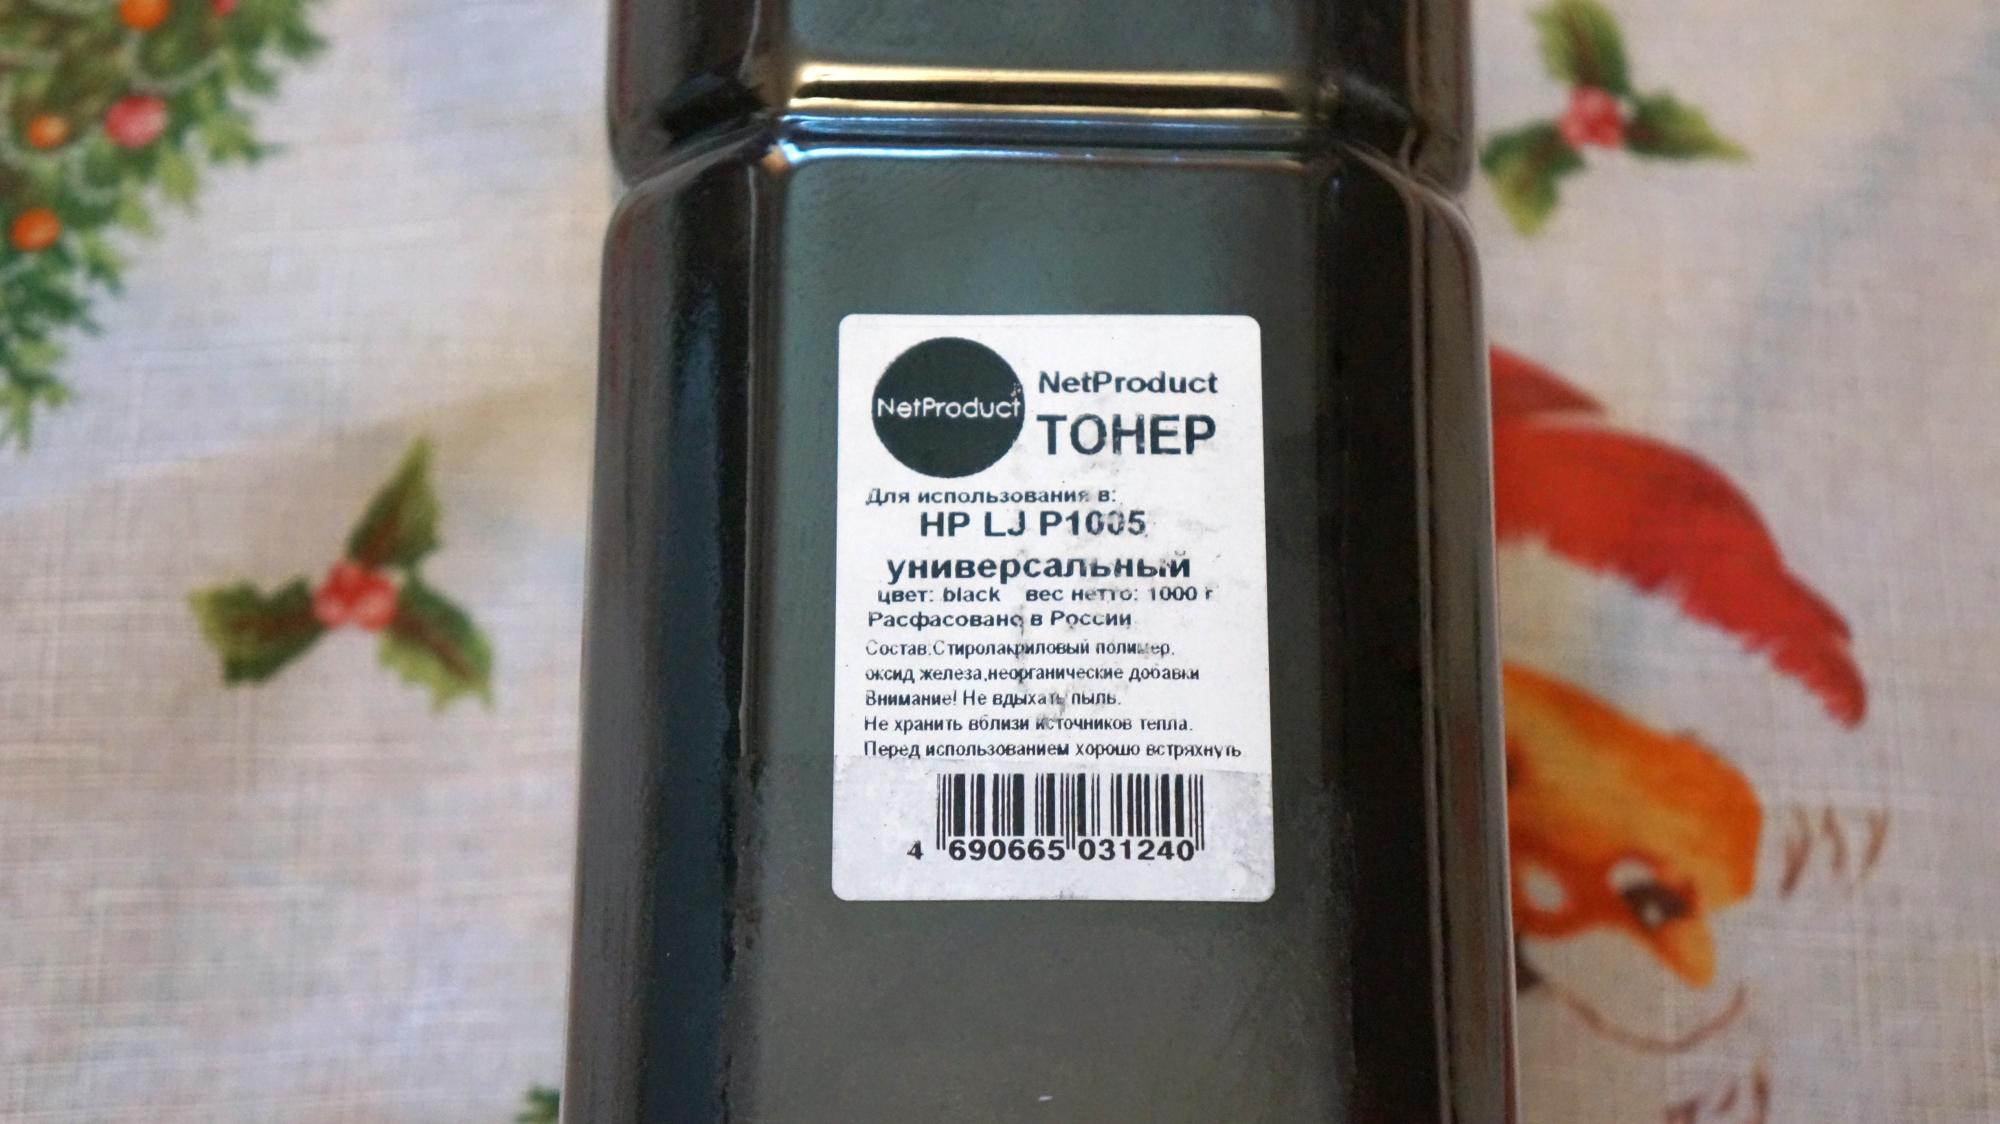 Тонер NetProduct HP P1005